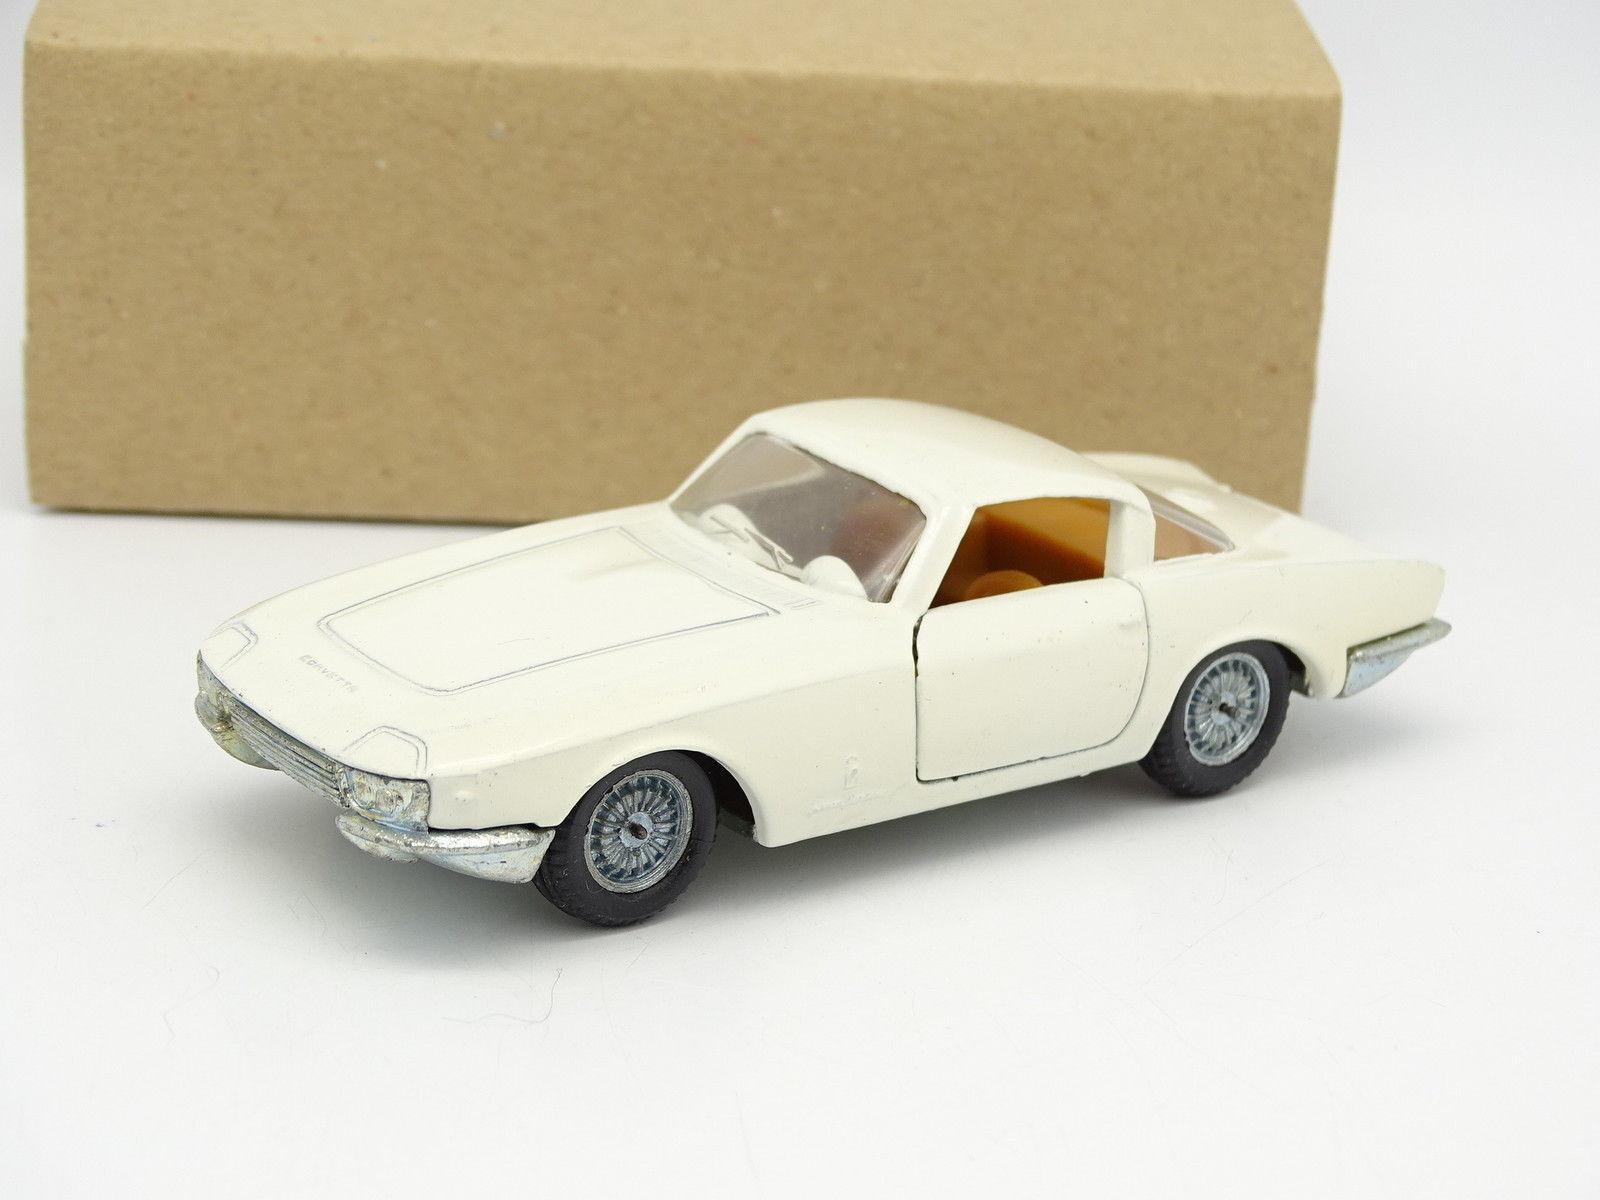 Politoys 1/43 - Chevrolet Corvette Pininfarina Rondine Bianco